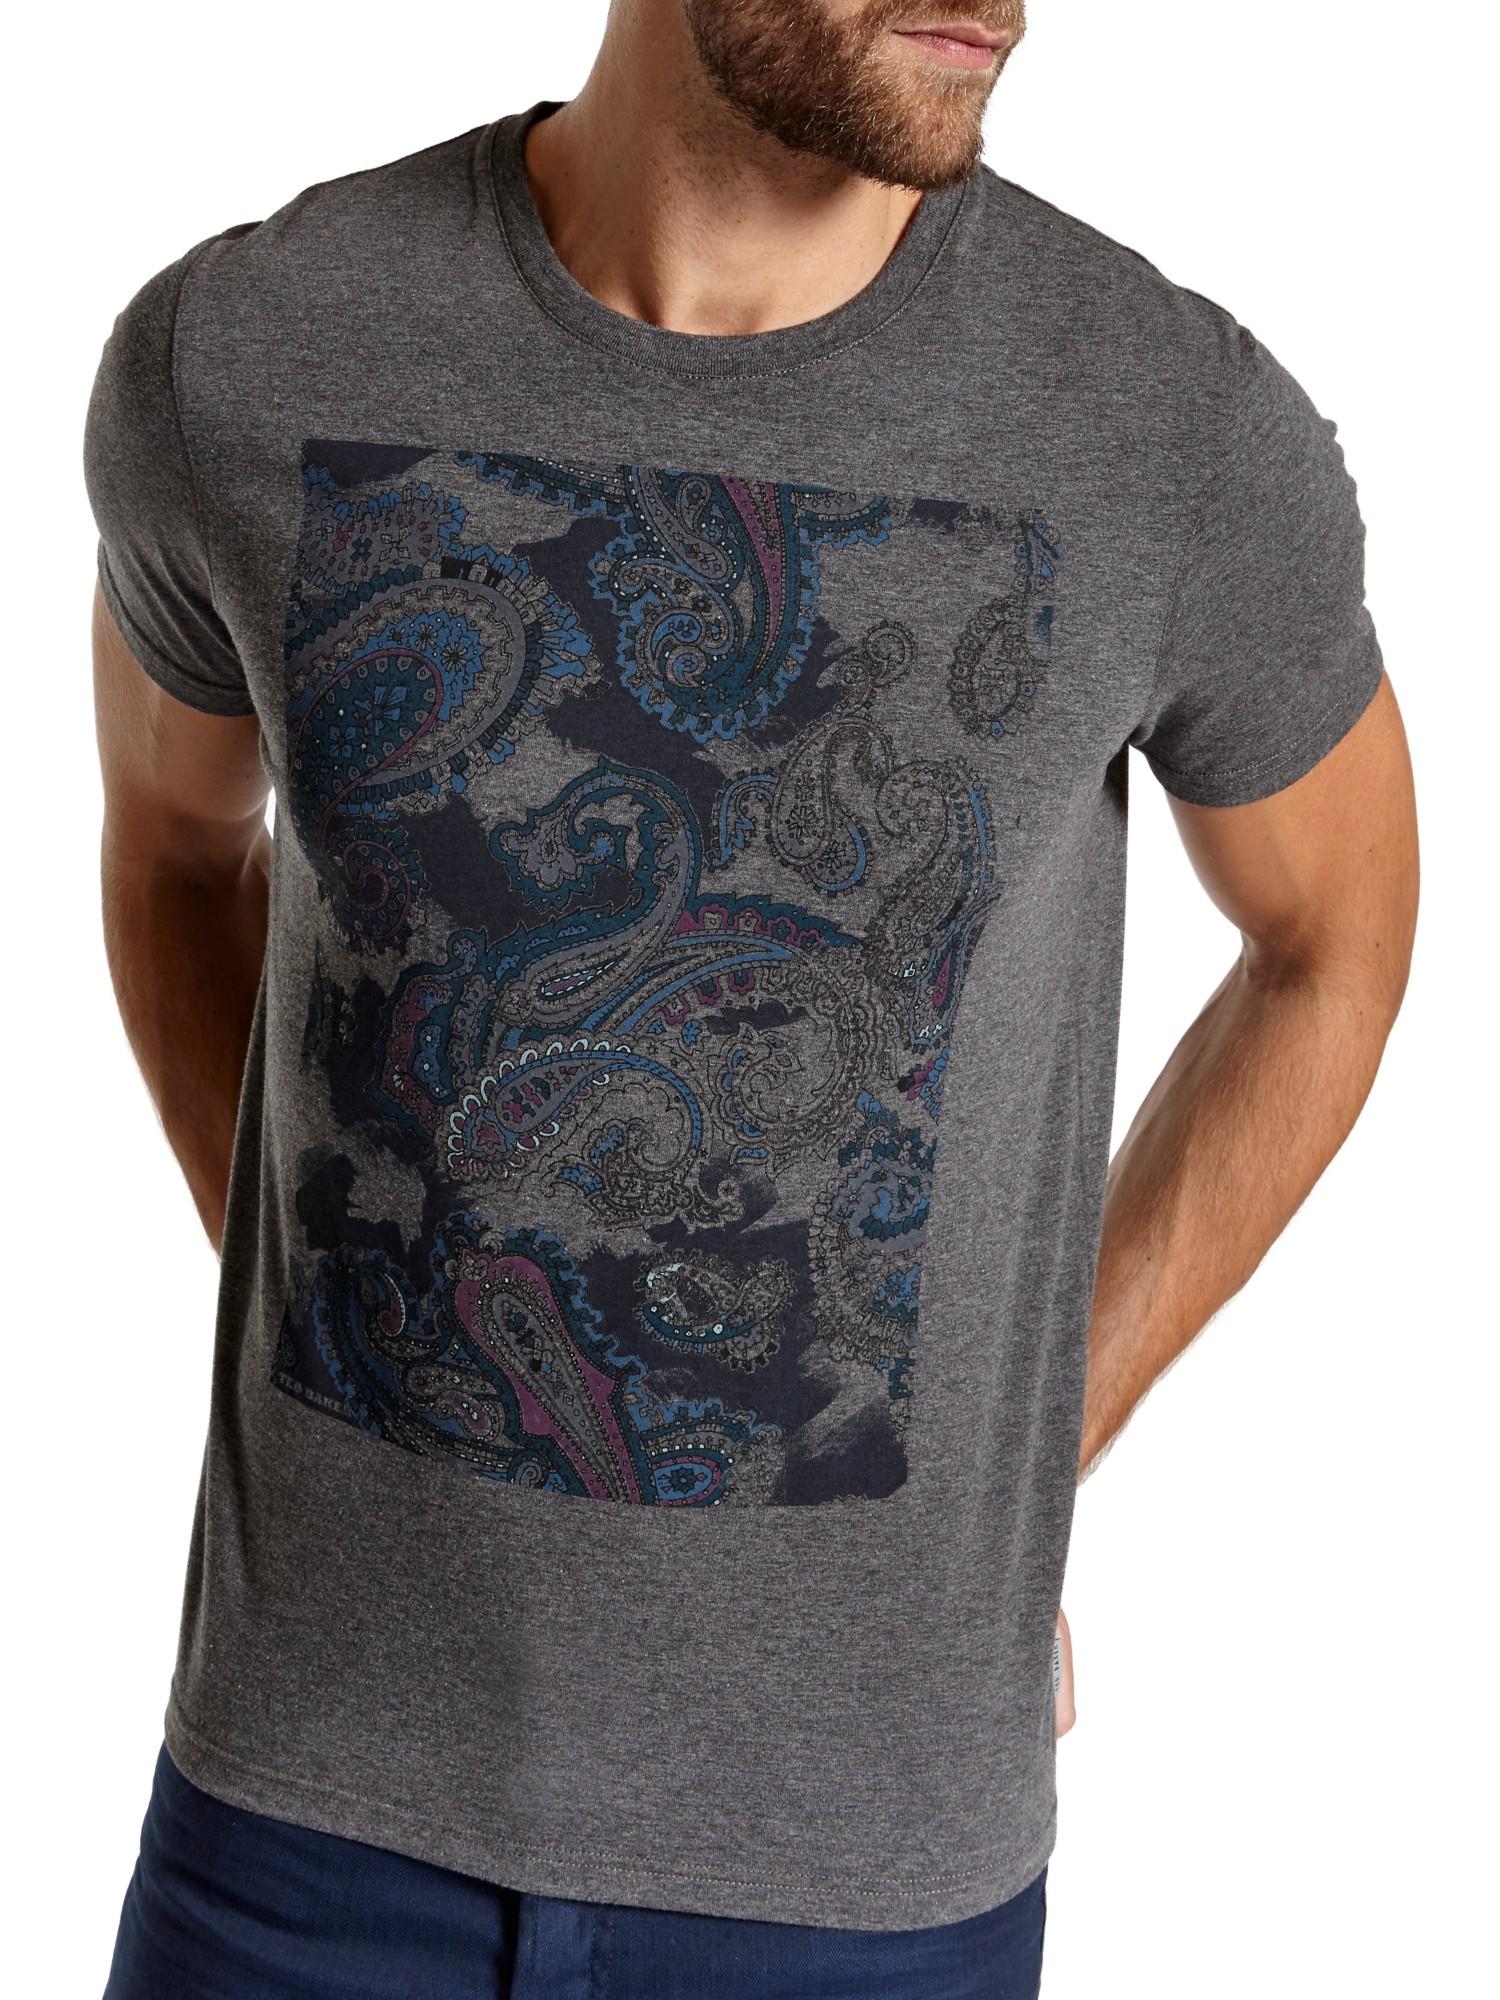 56848a374c9b Ted Baker Kestrol Paisley Print T-shirt in Gray for Men - Lyst